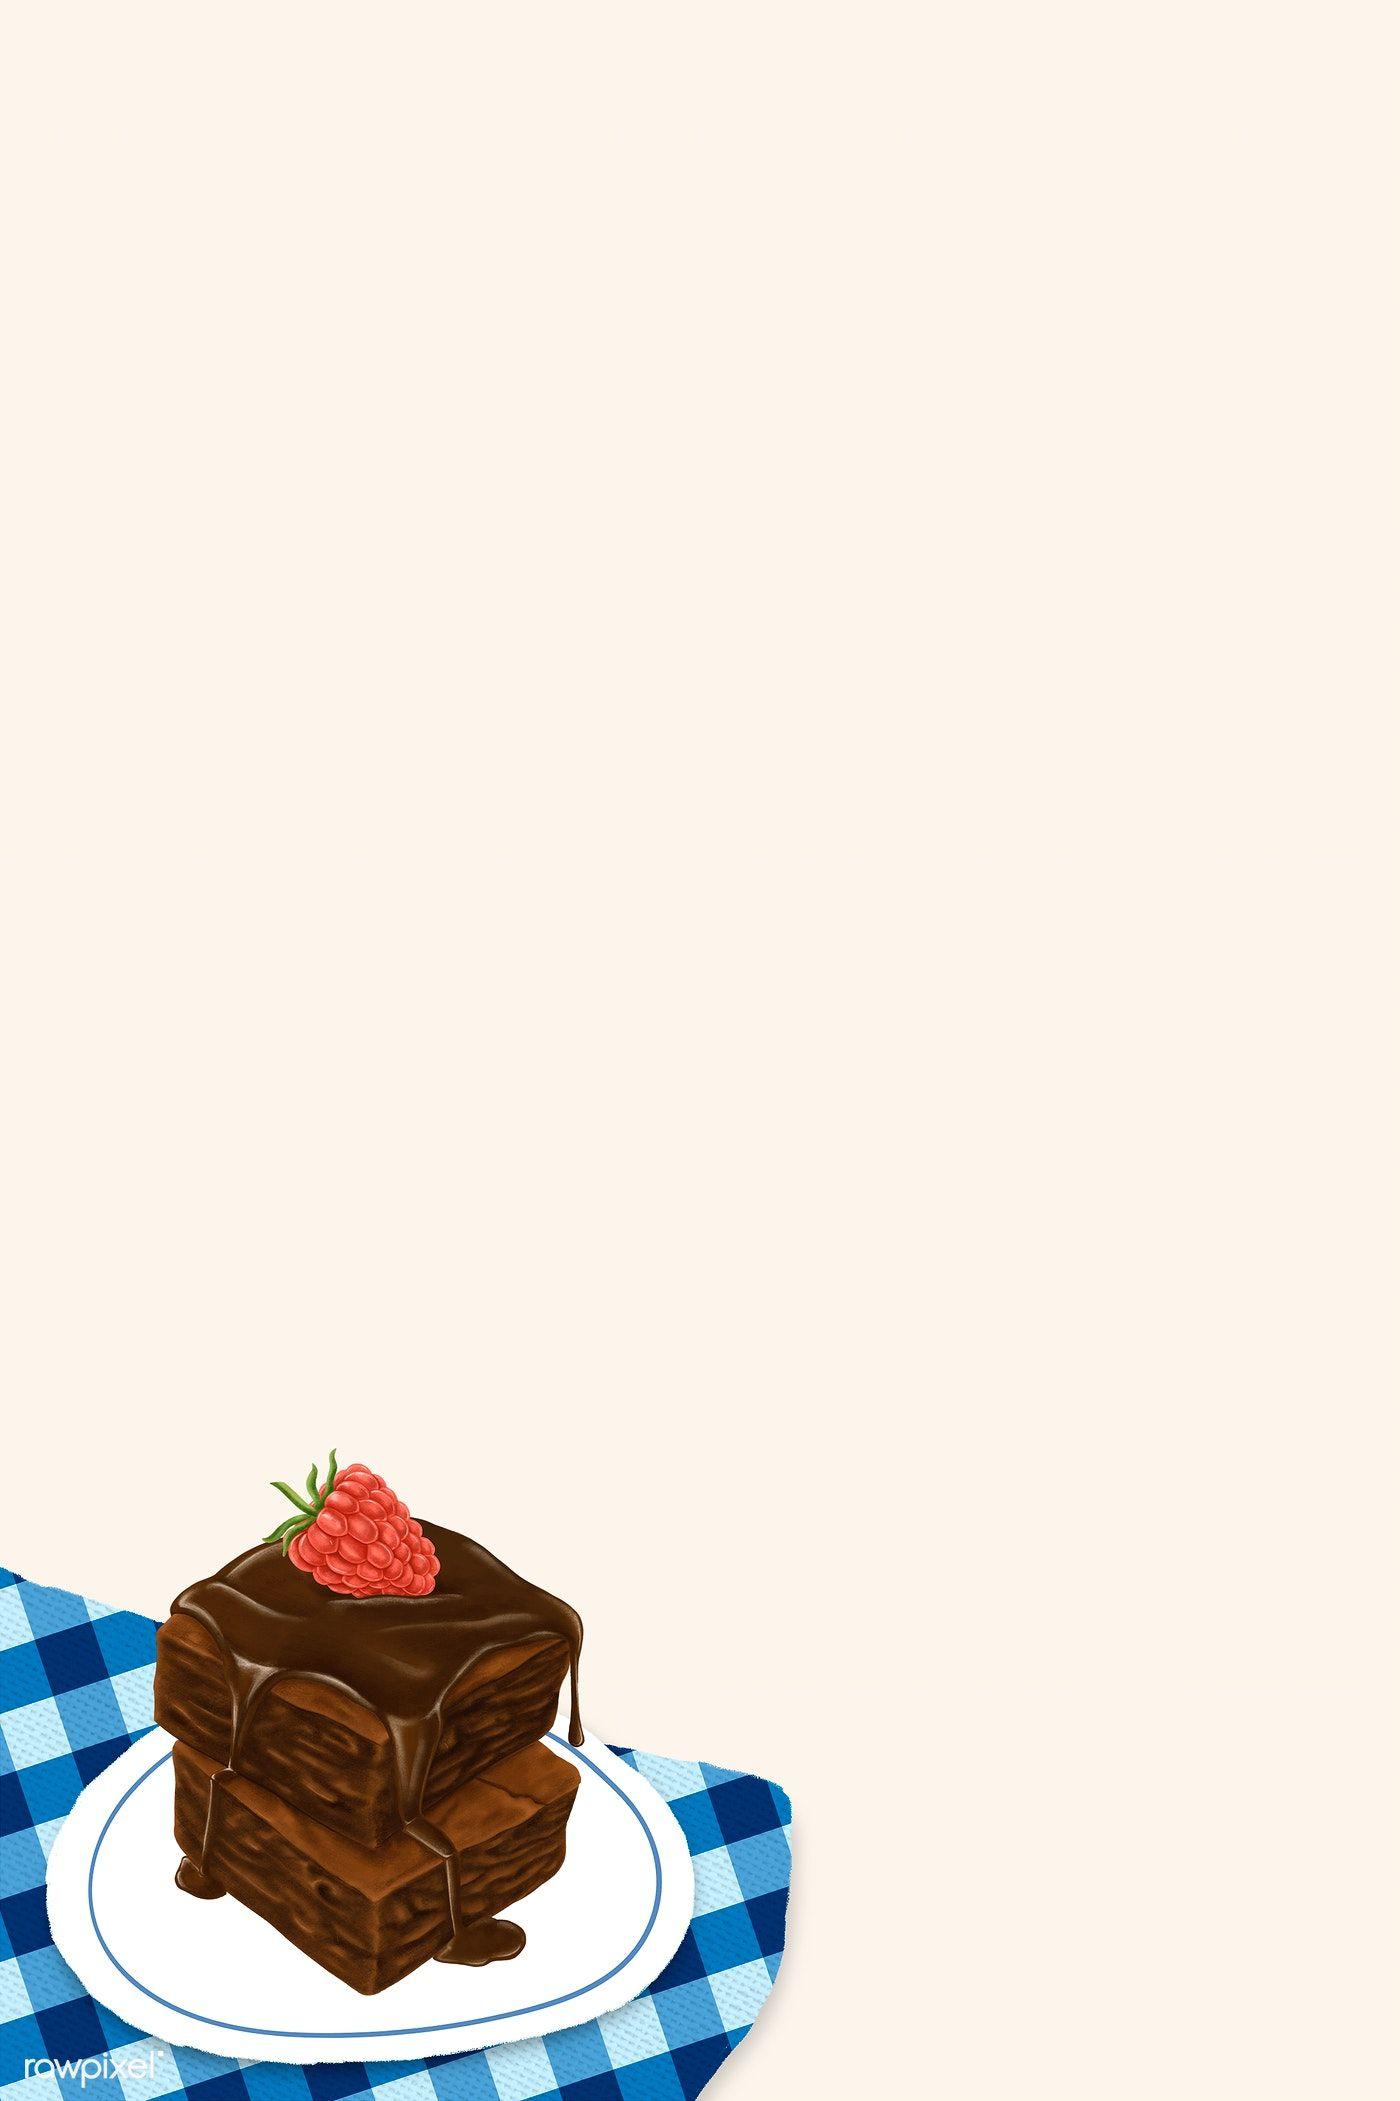 Hand Drawn Bakery Banner Mockup Free Image By Rawpixel Com Noon Melhores Brownies Ilustracao De Bolos Arte De Doces